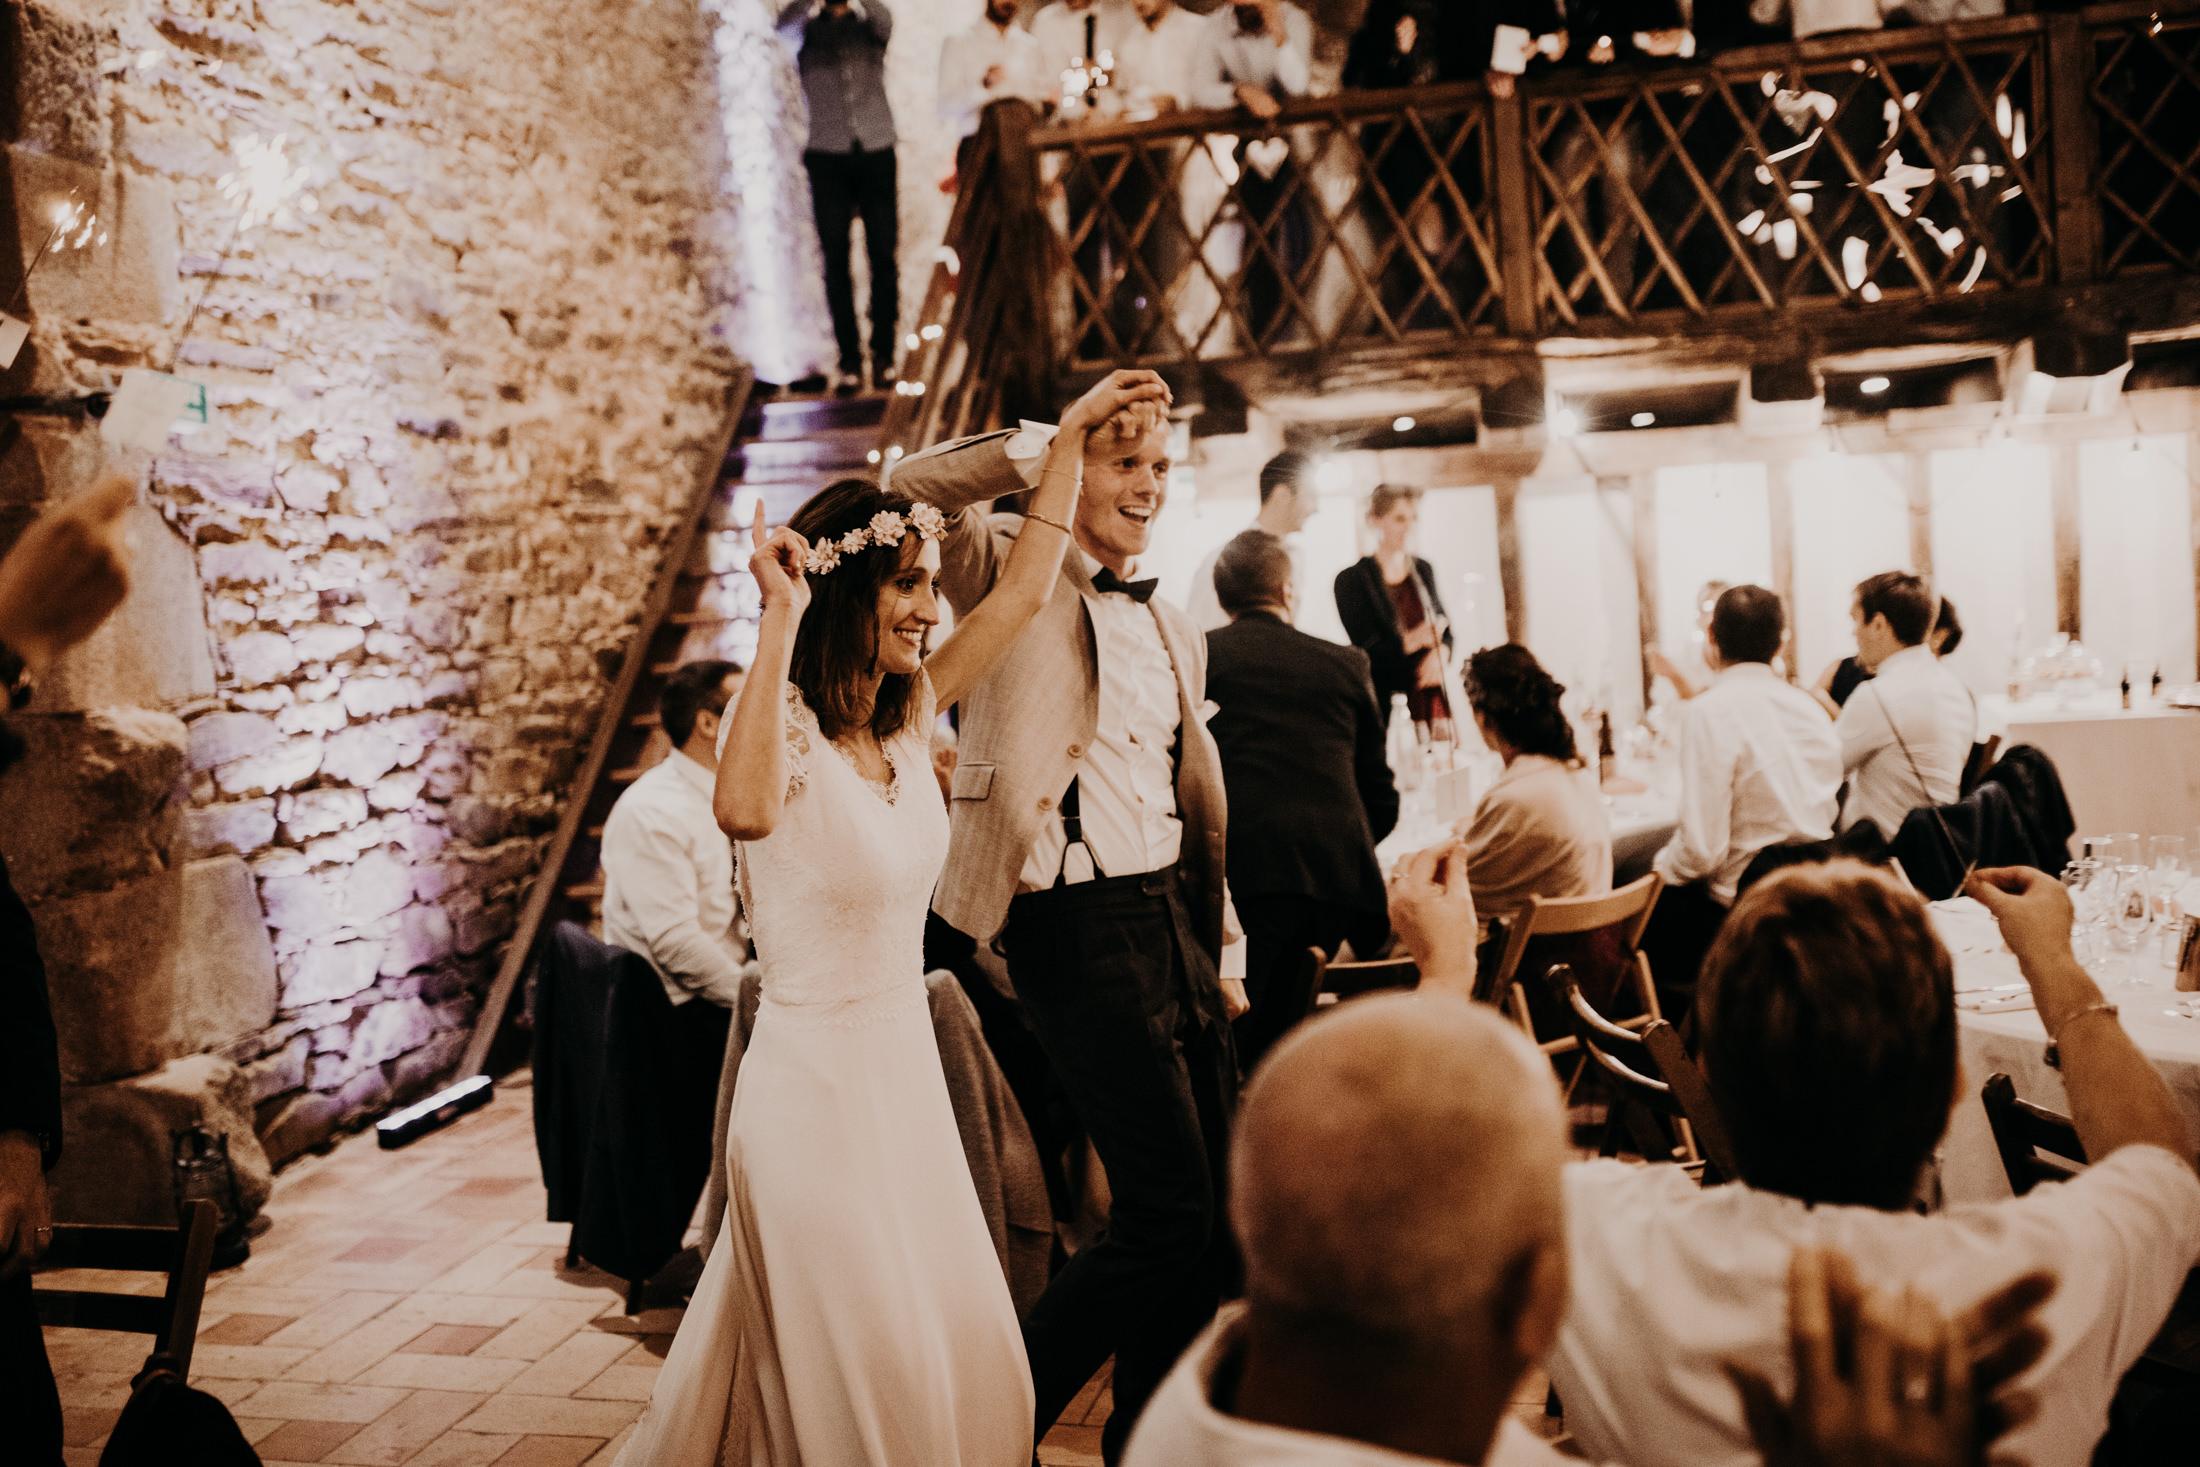 Mariage auvergne photographe wedding_-99.jpg